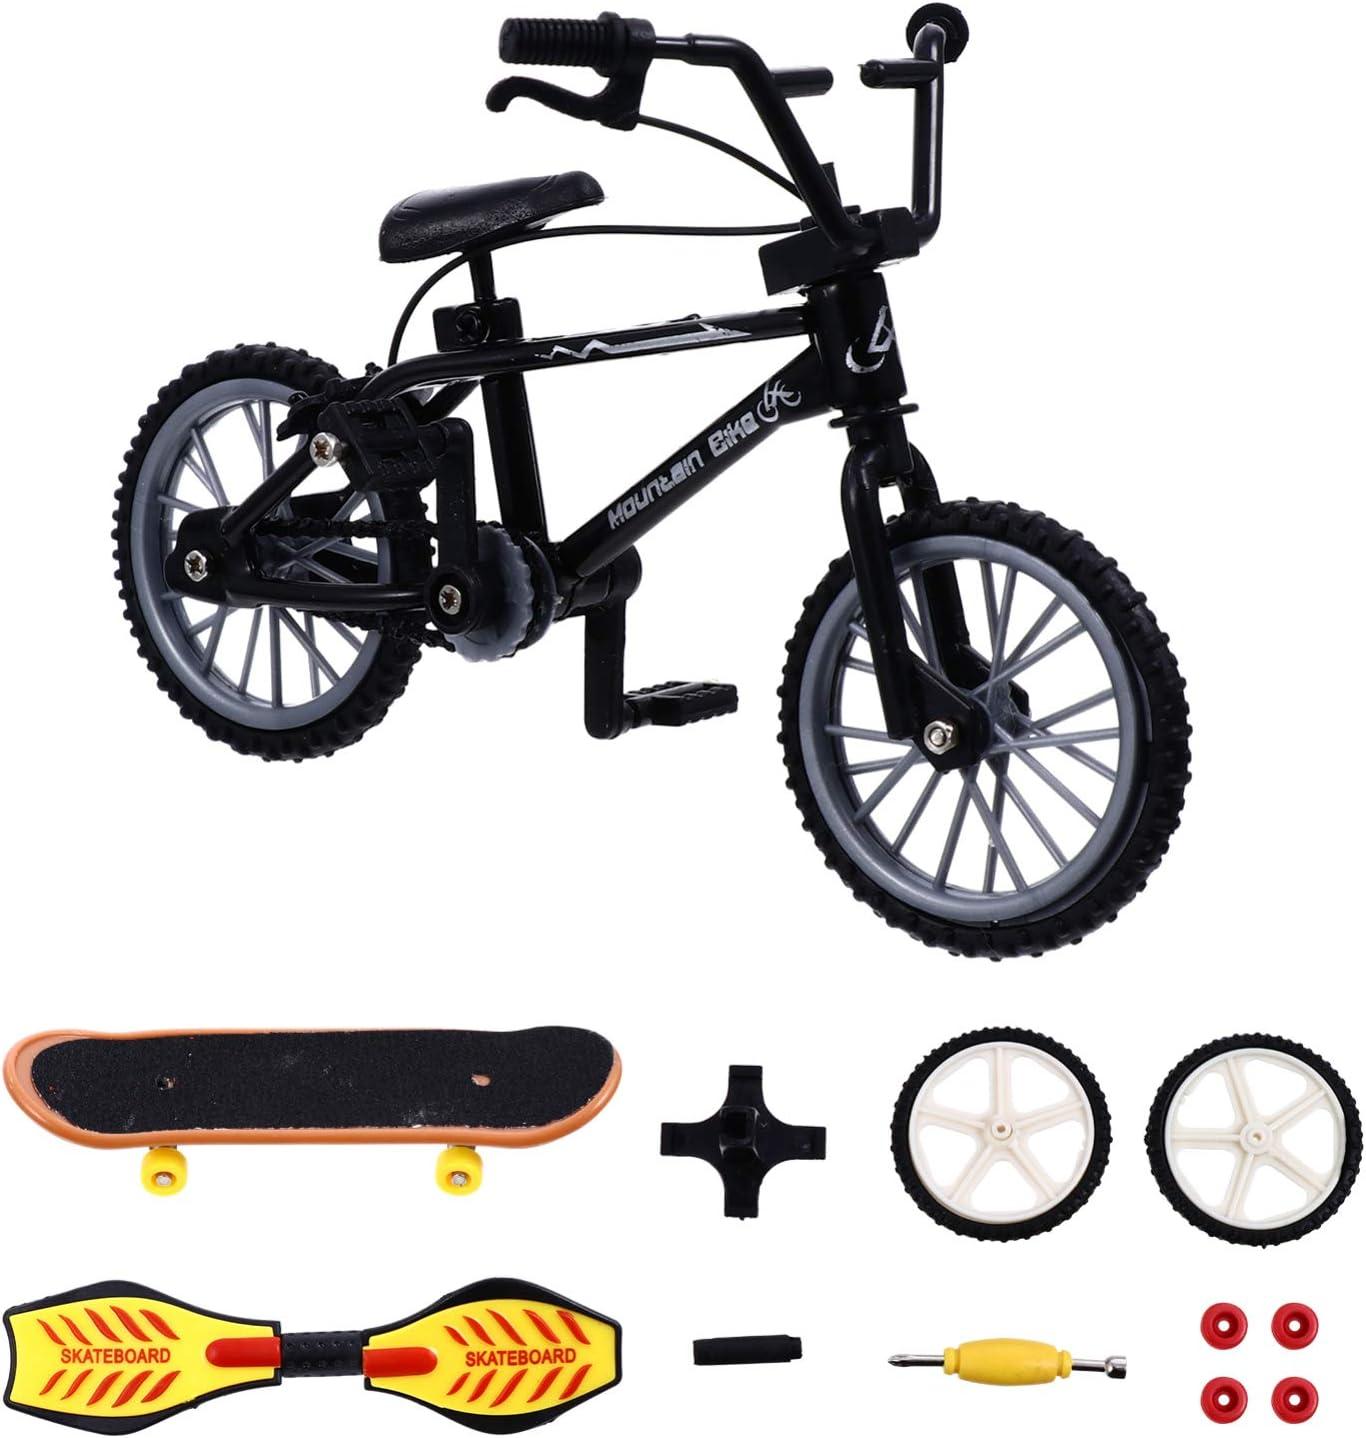 NUOBESTY Mini Finger Sports Set Fingert Complete Free Shipping Skateboards Bikes New arrival